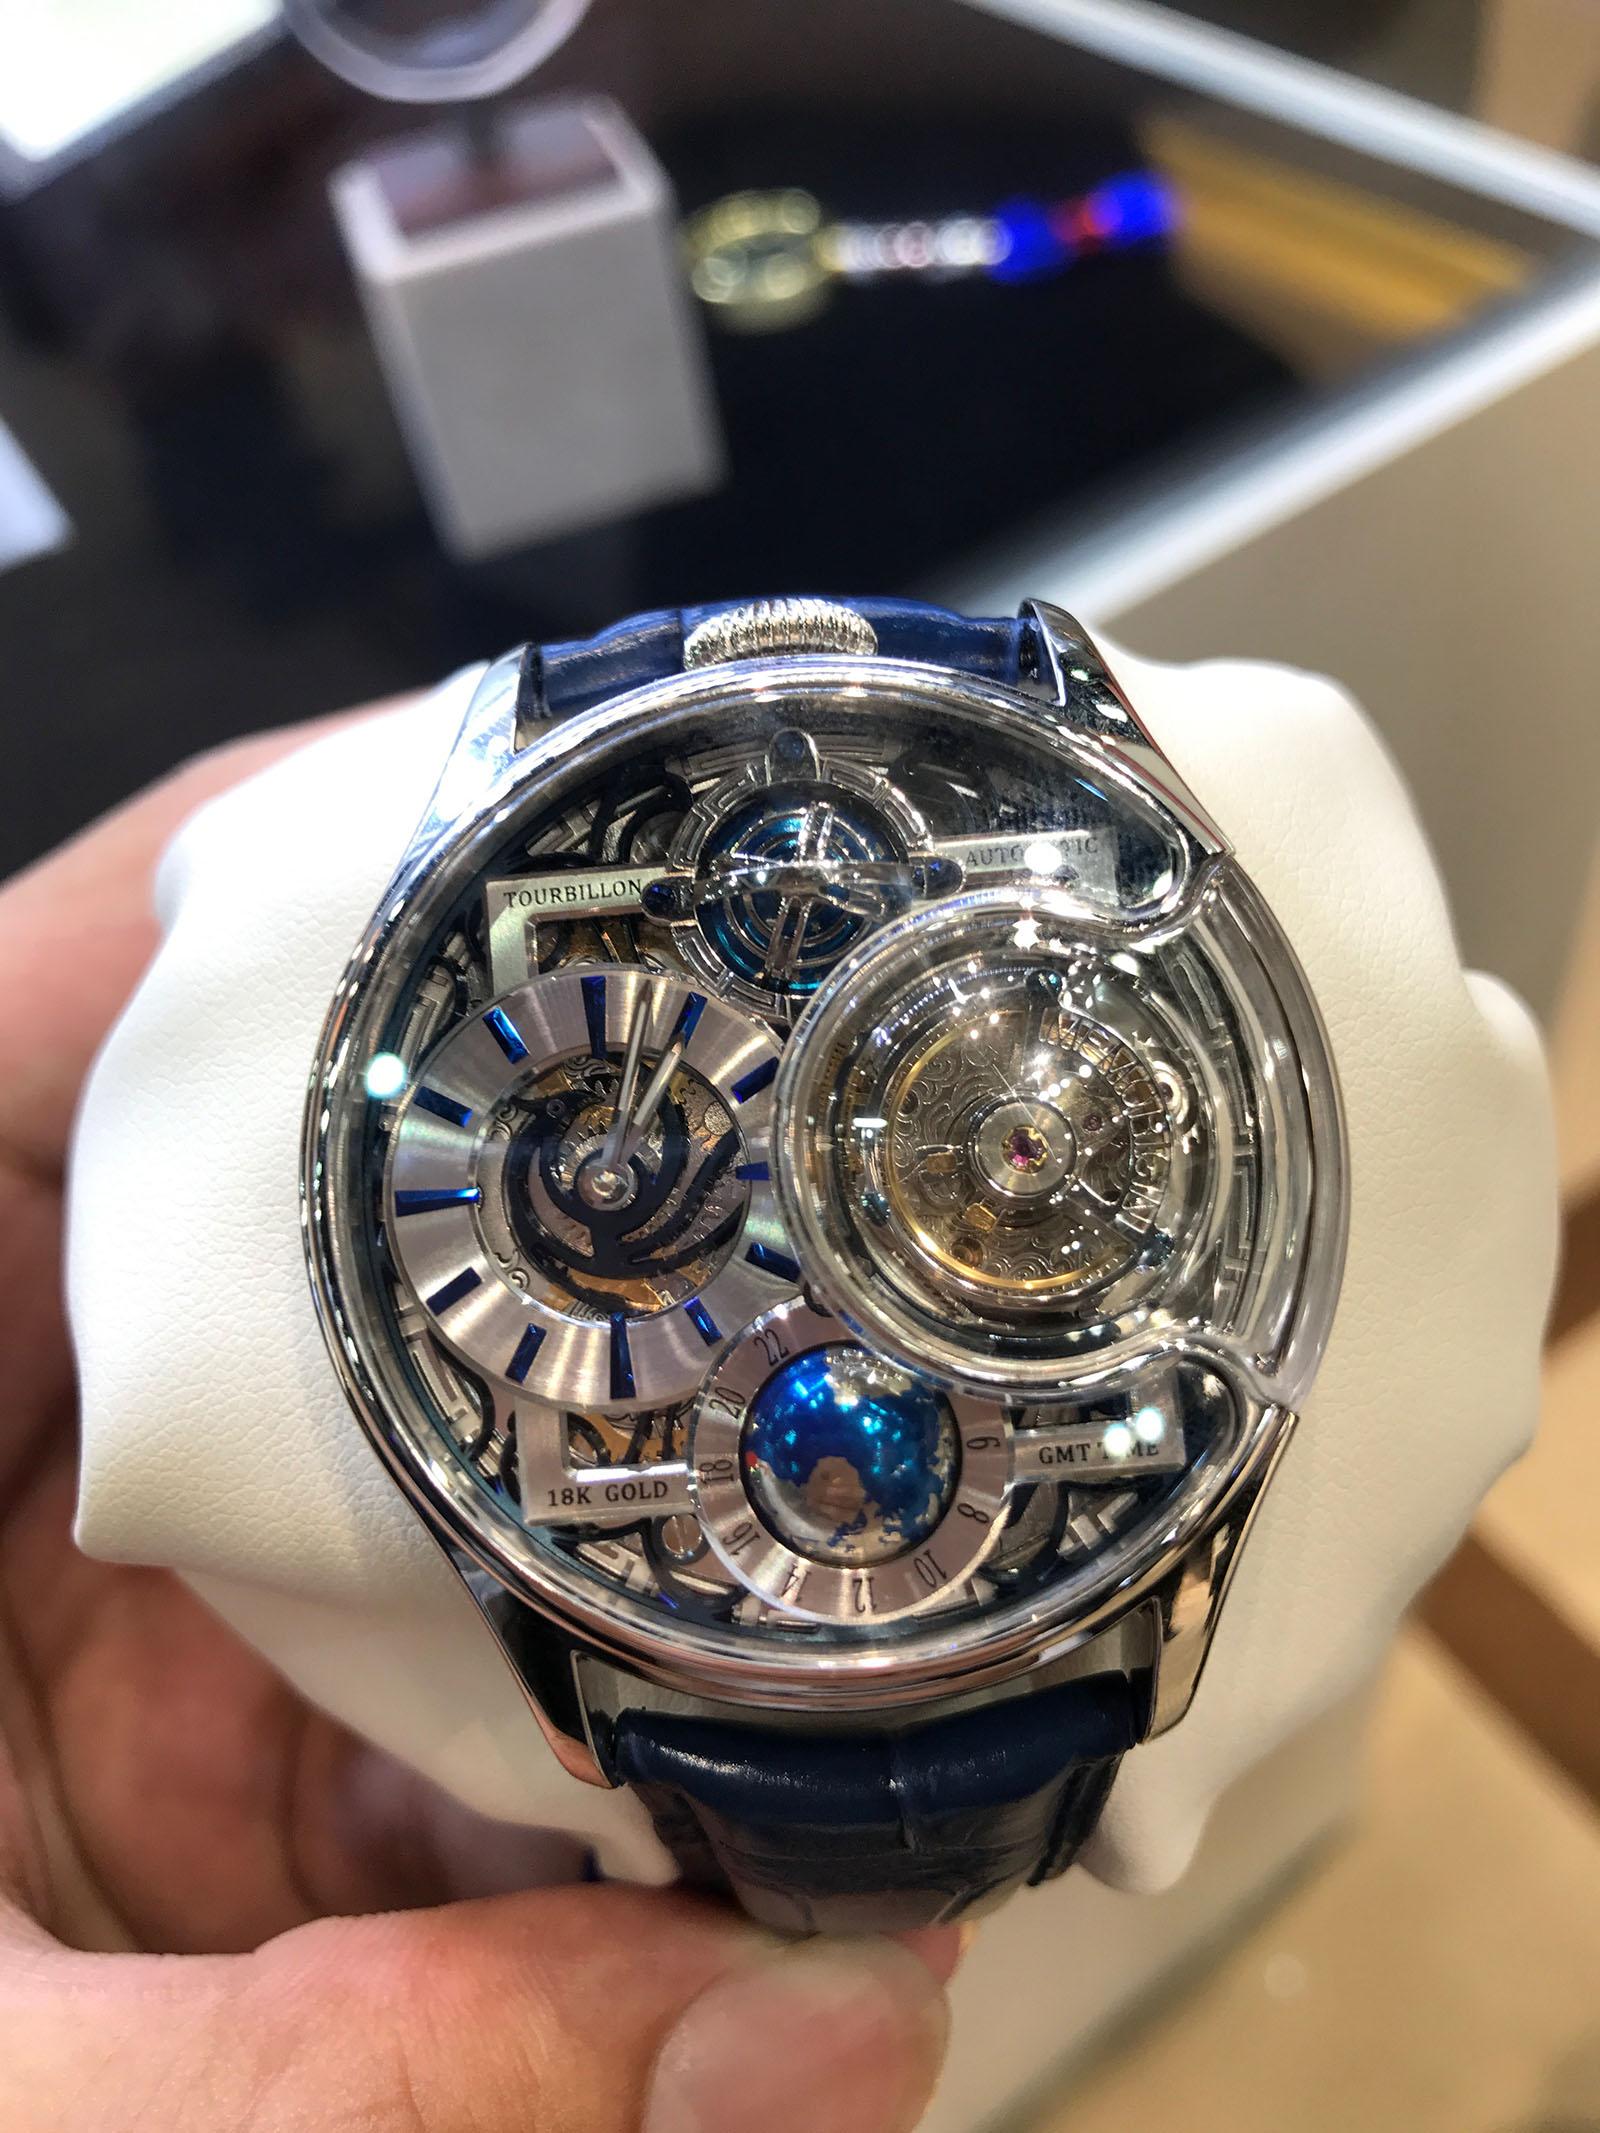 Hong Kong Watch & Clock Fair (HKWCF) 2